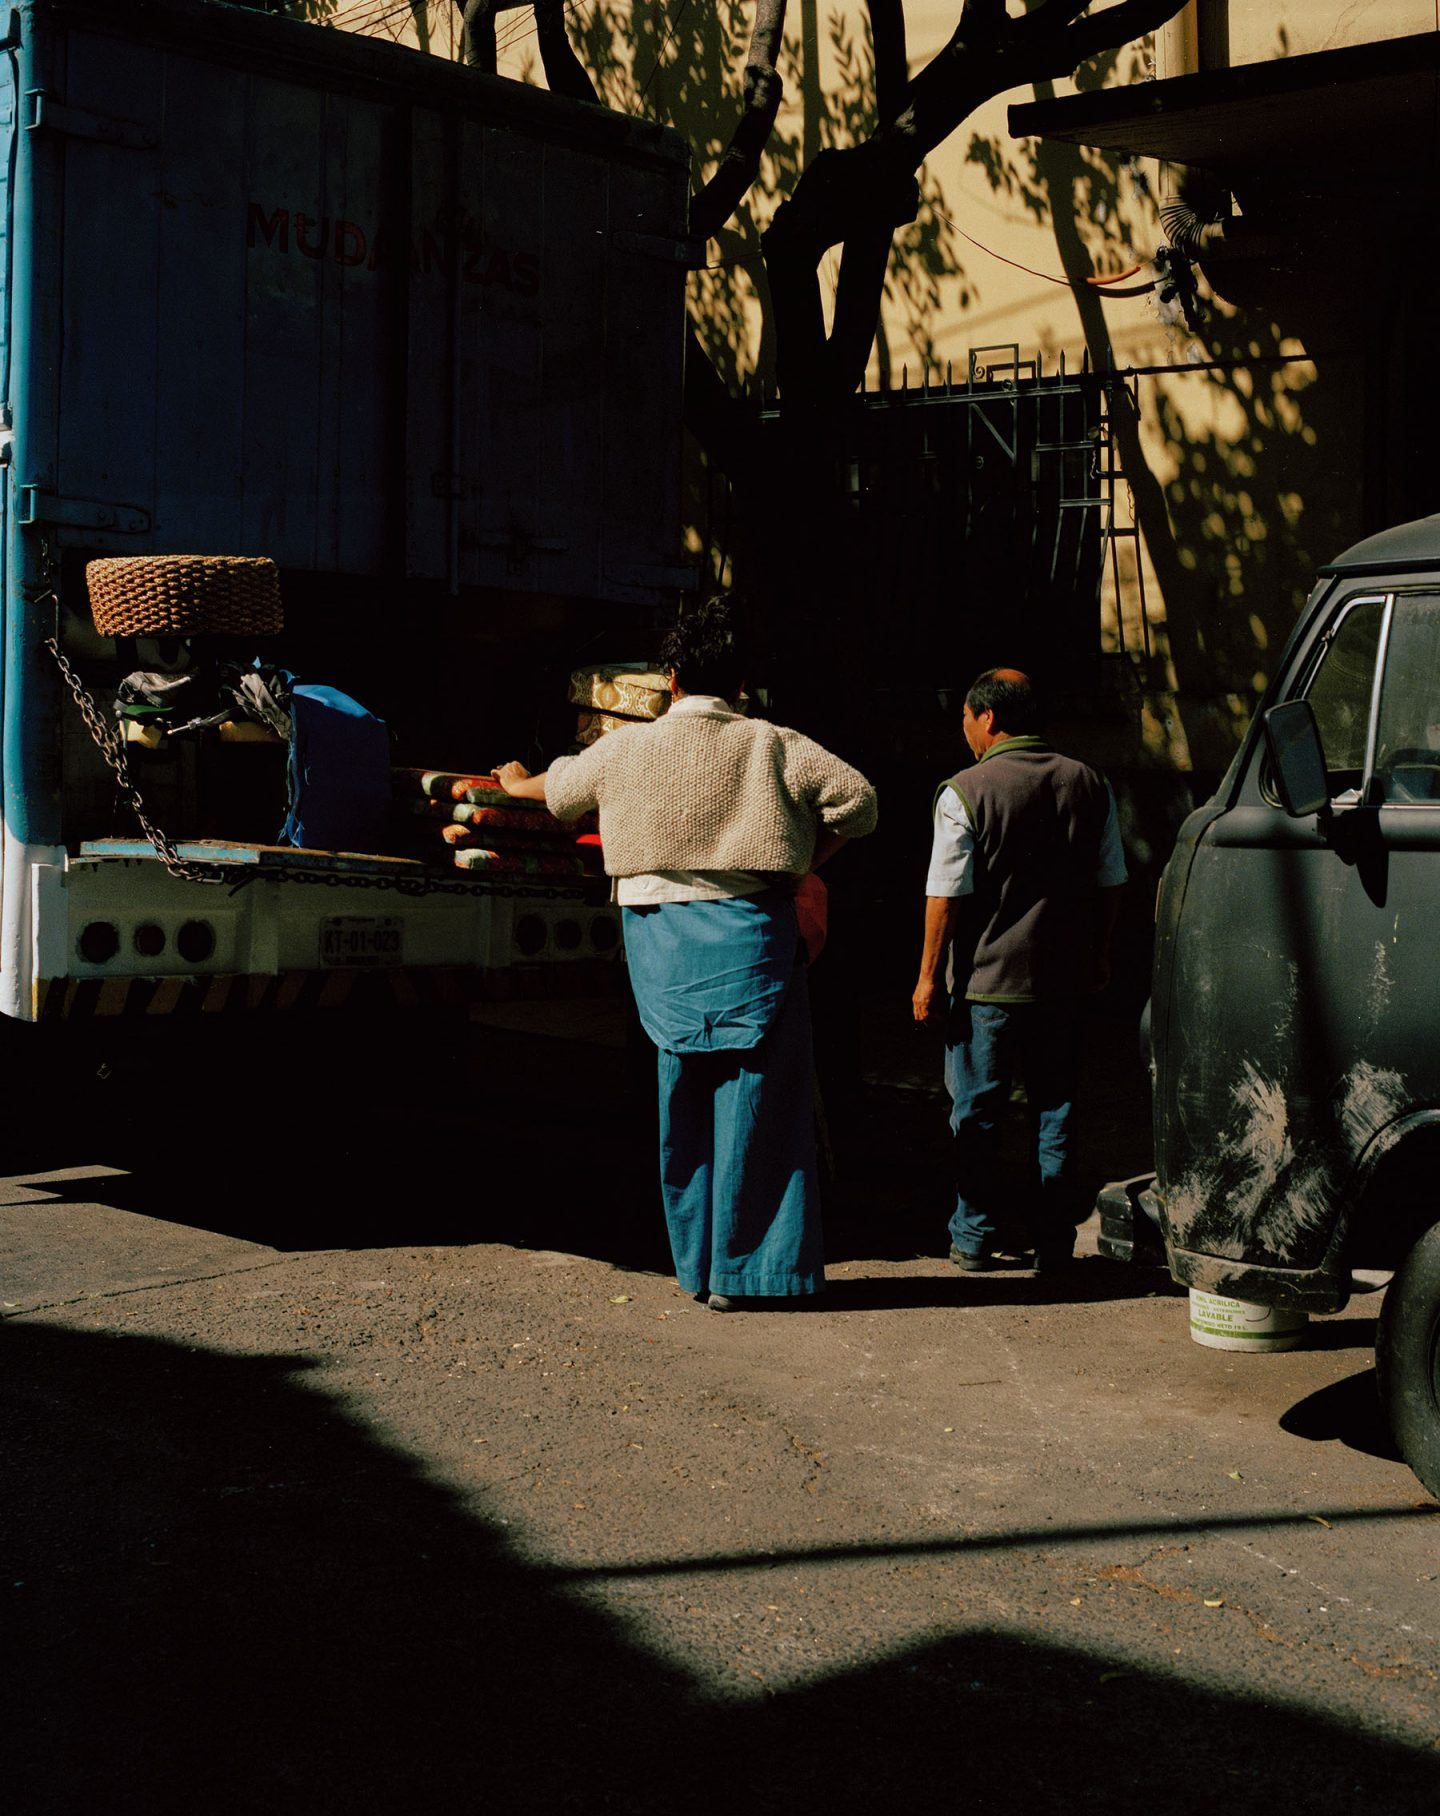 IGNANT-Photography-Joe-Perri-Mexico-13